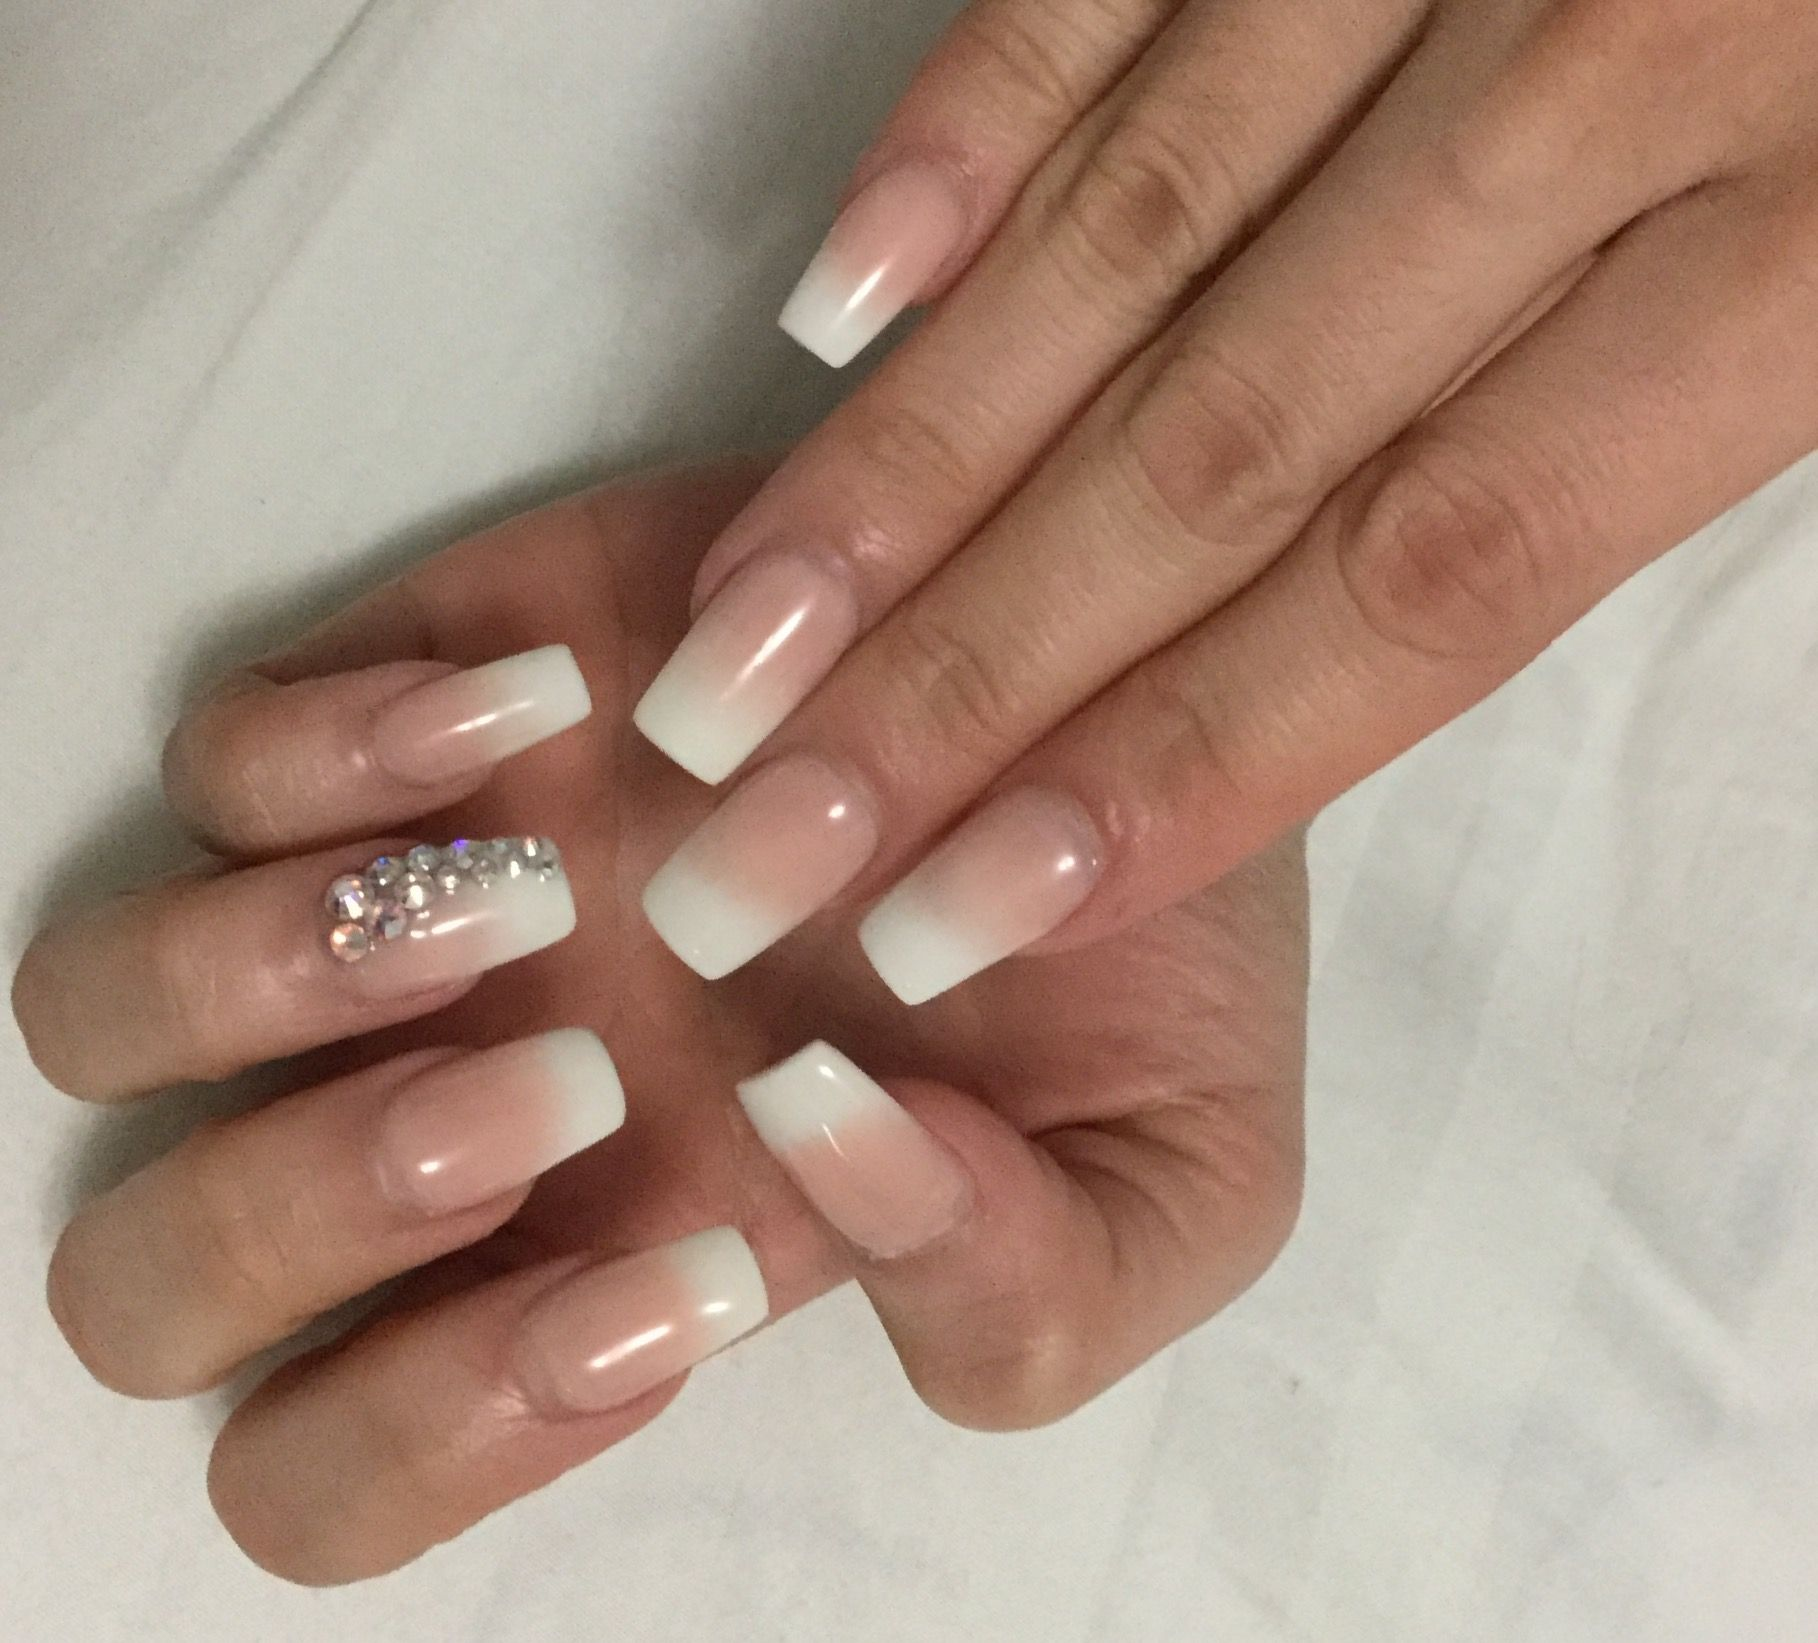 Celfie nails spa | Nails salon in austin | Pinterest | Nail spa and ...